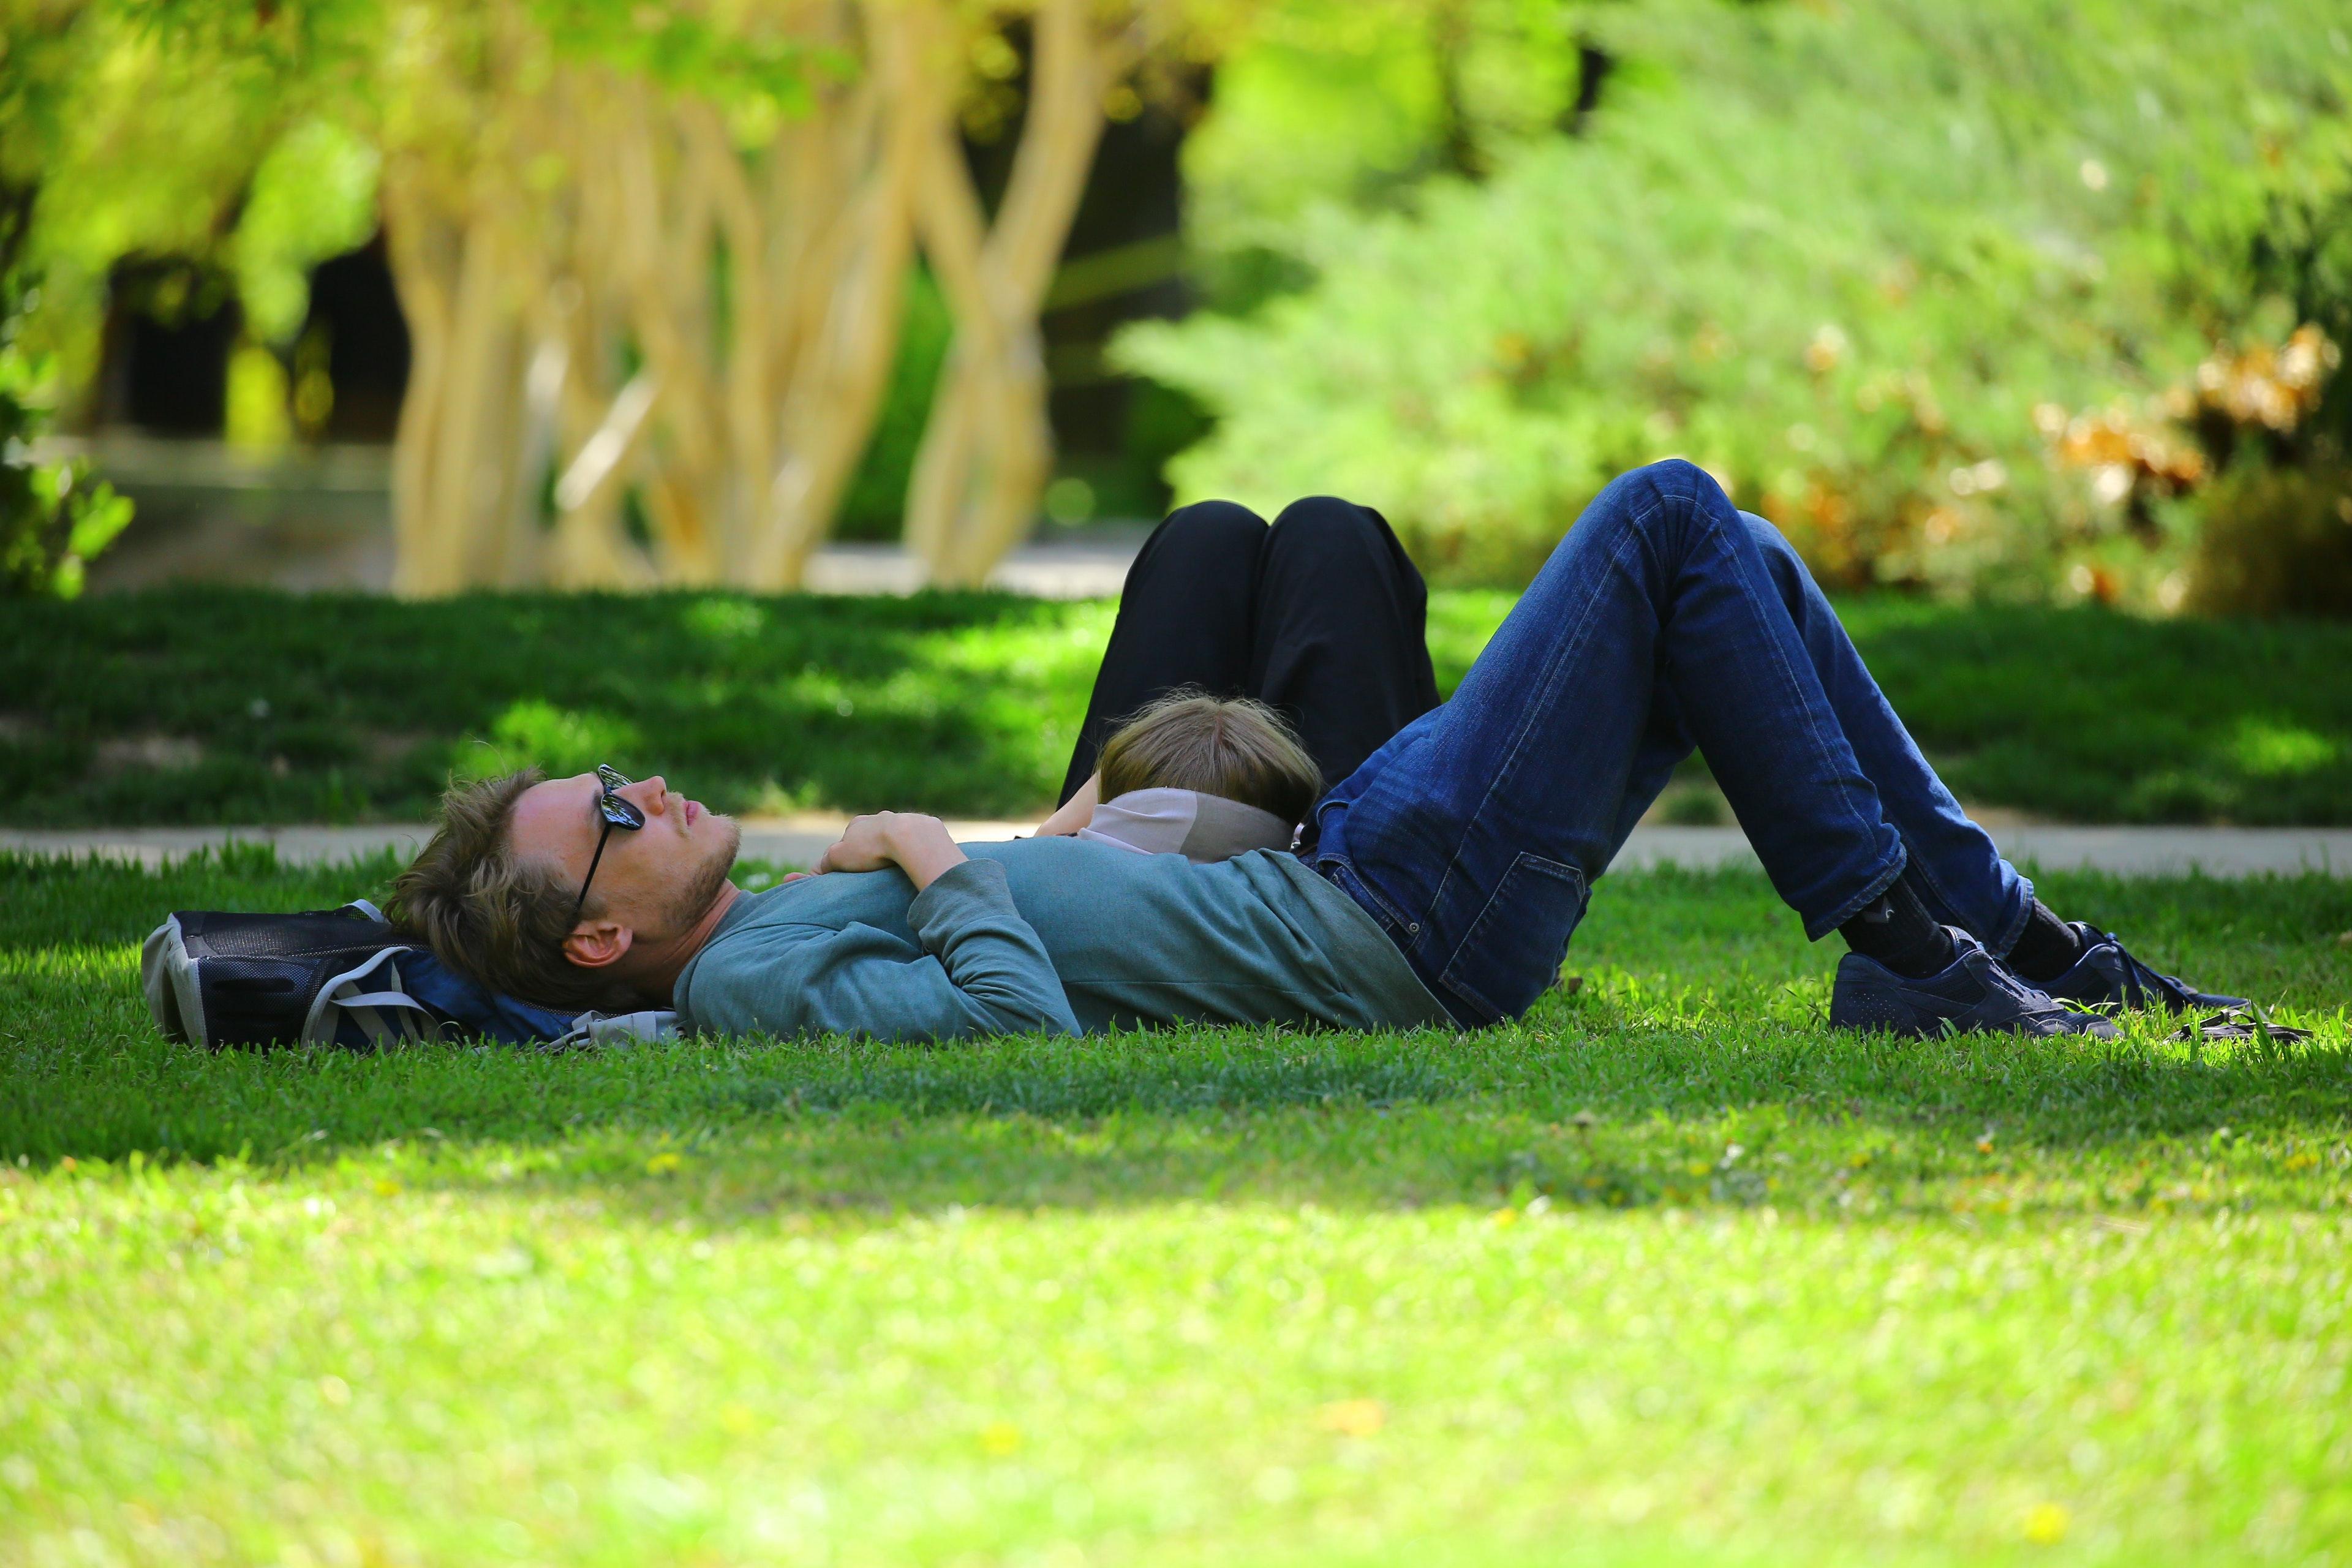 Man wearing blue long sleeve shirt lying on ground during daytime photo